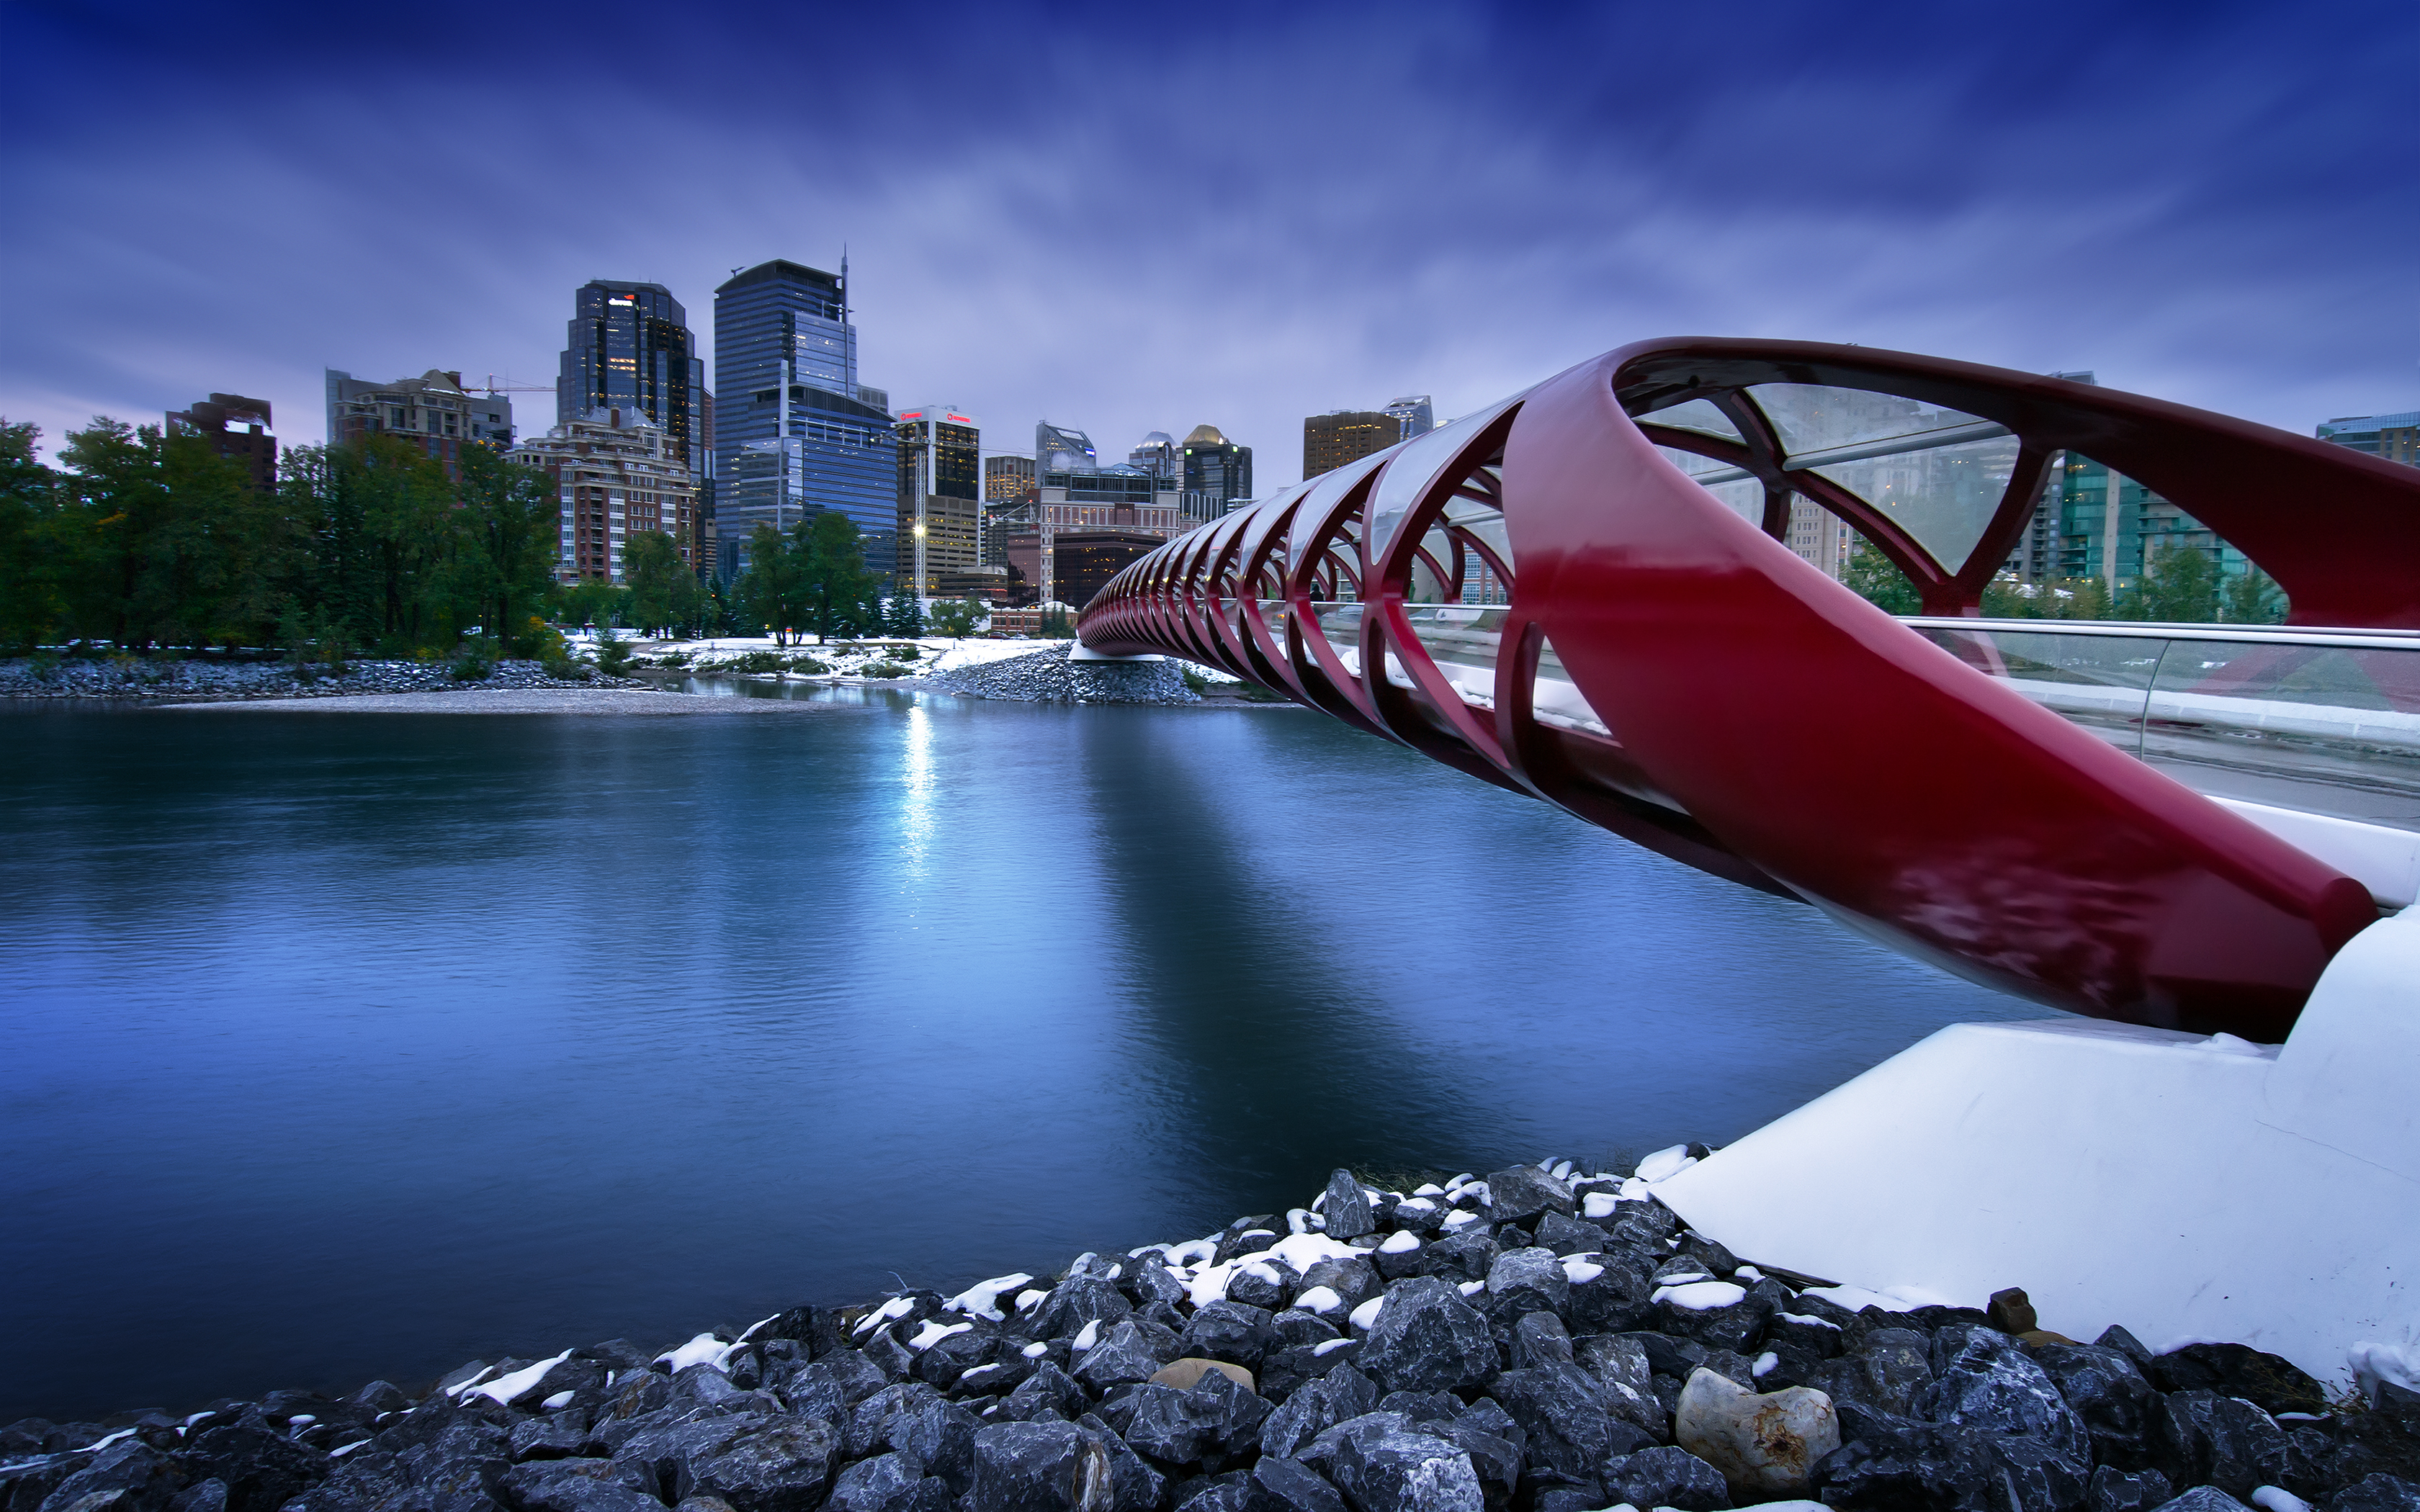 природа страны архитектура река мост Александр  № 2234692 бесплатно